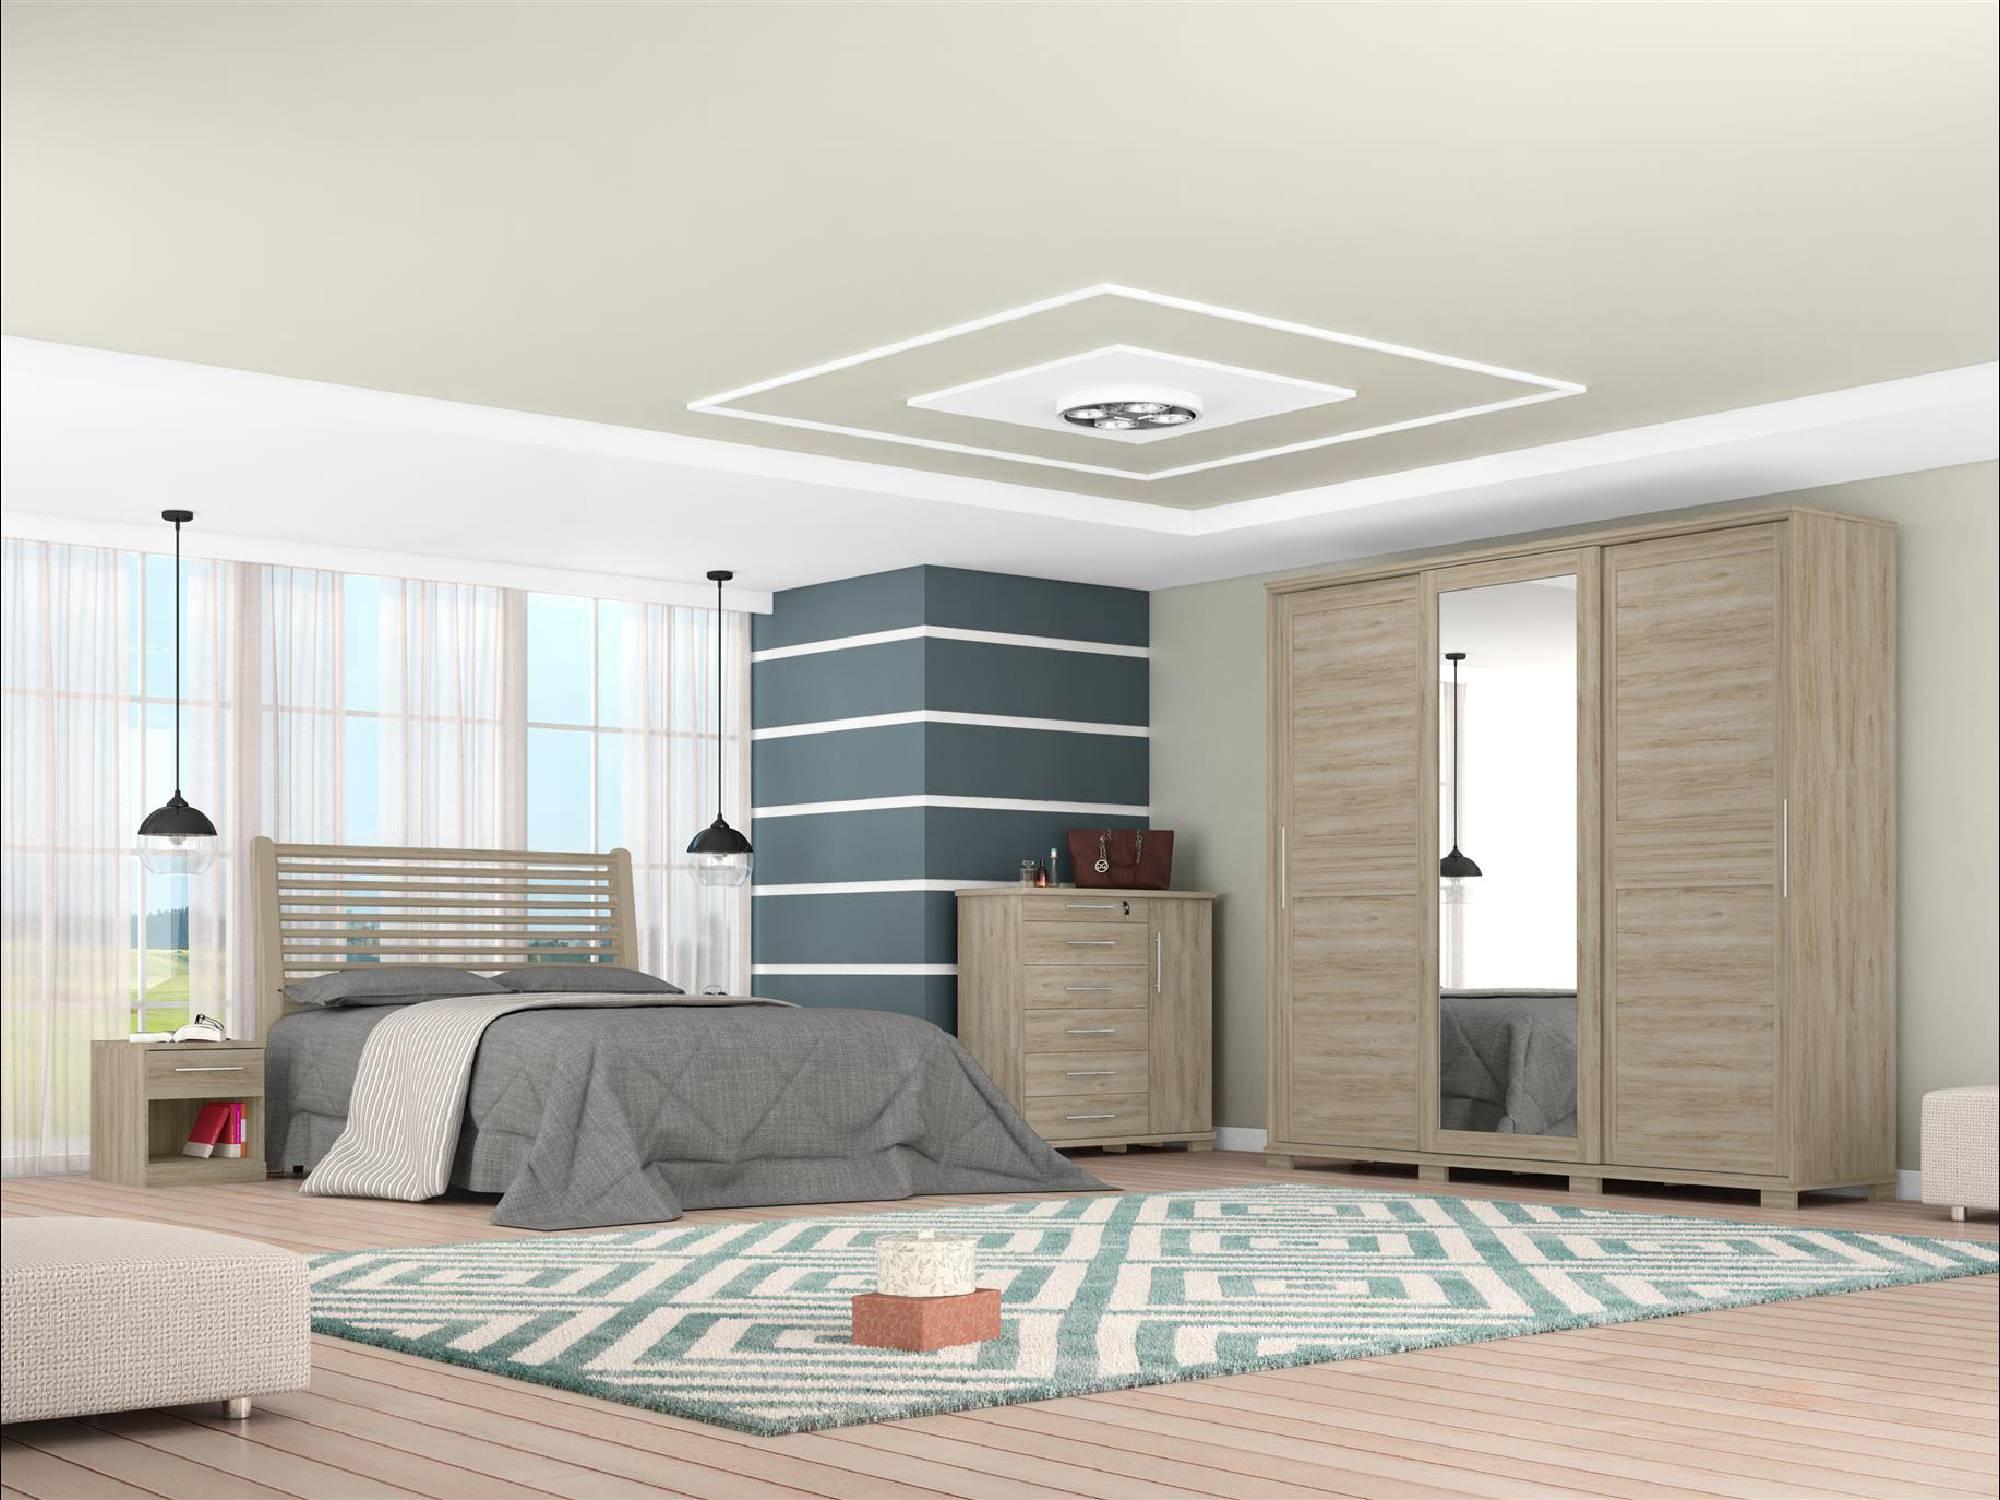 dormitorios_roupeiros_robel_5